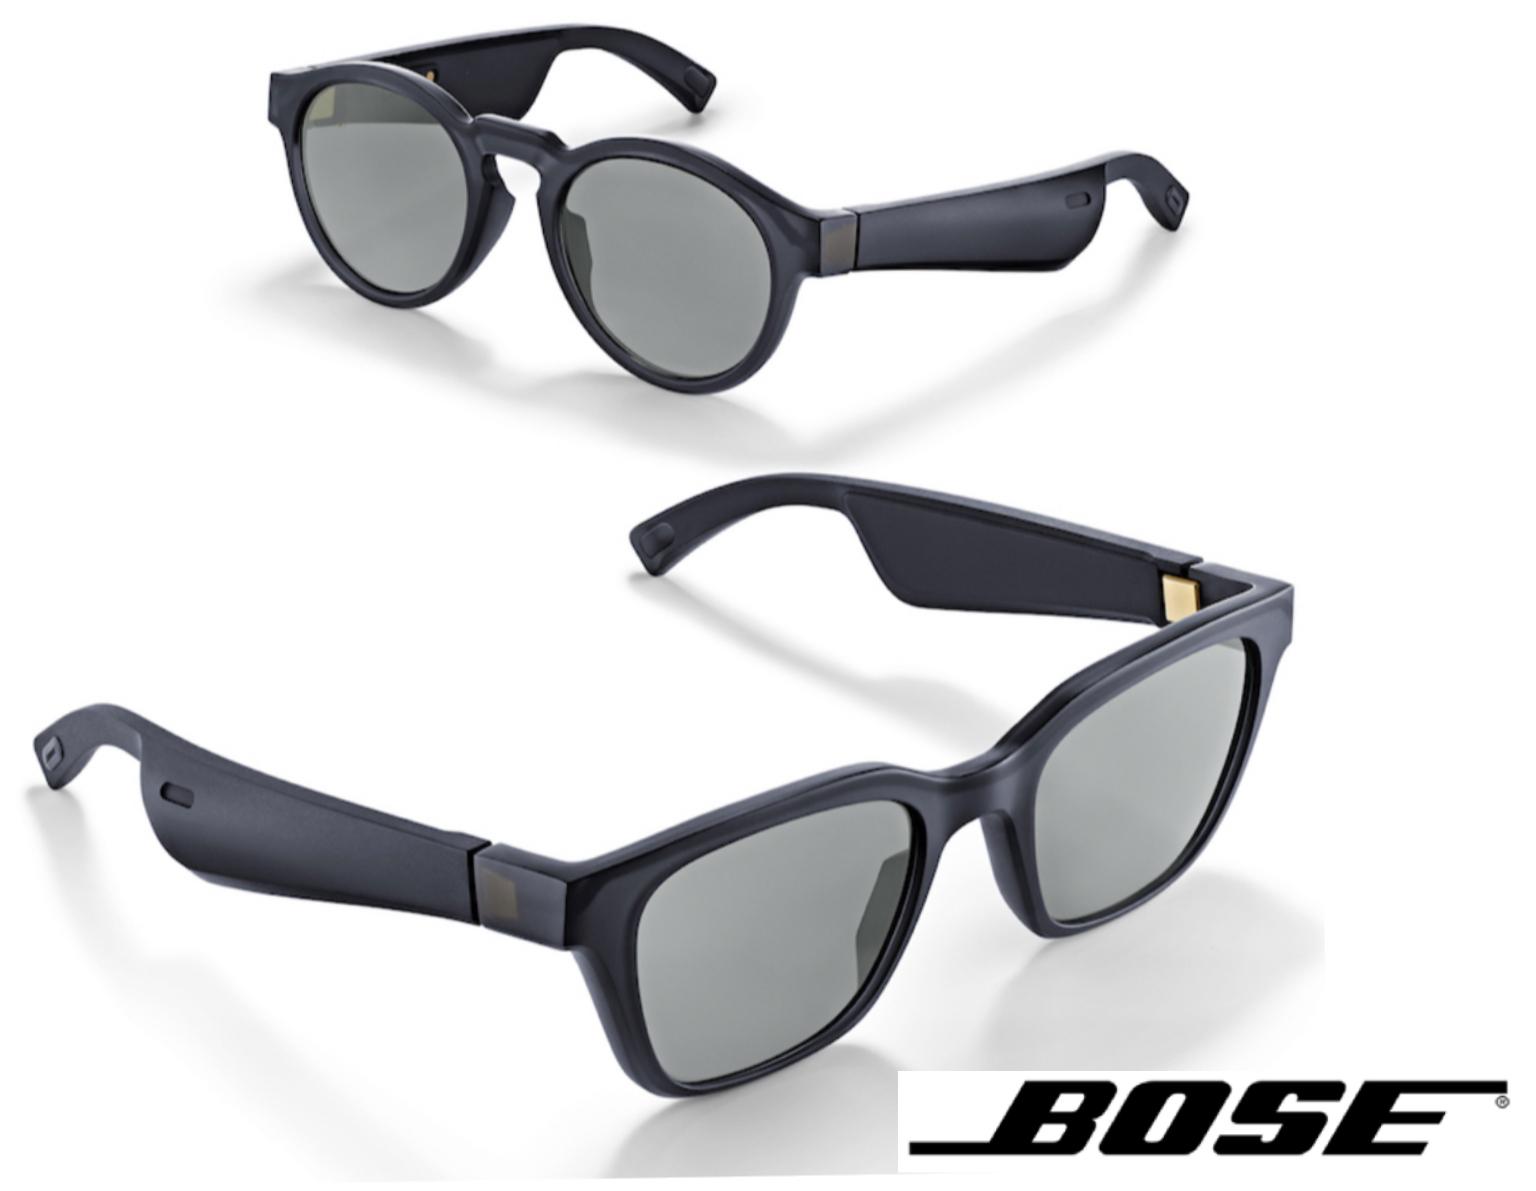 Bose Frames Audio Sonnenbrille Modell Alto oder Modell Rondo für je 159,20€ inkl. Versandkosten